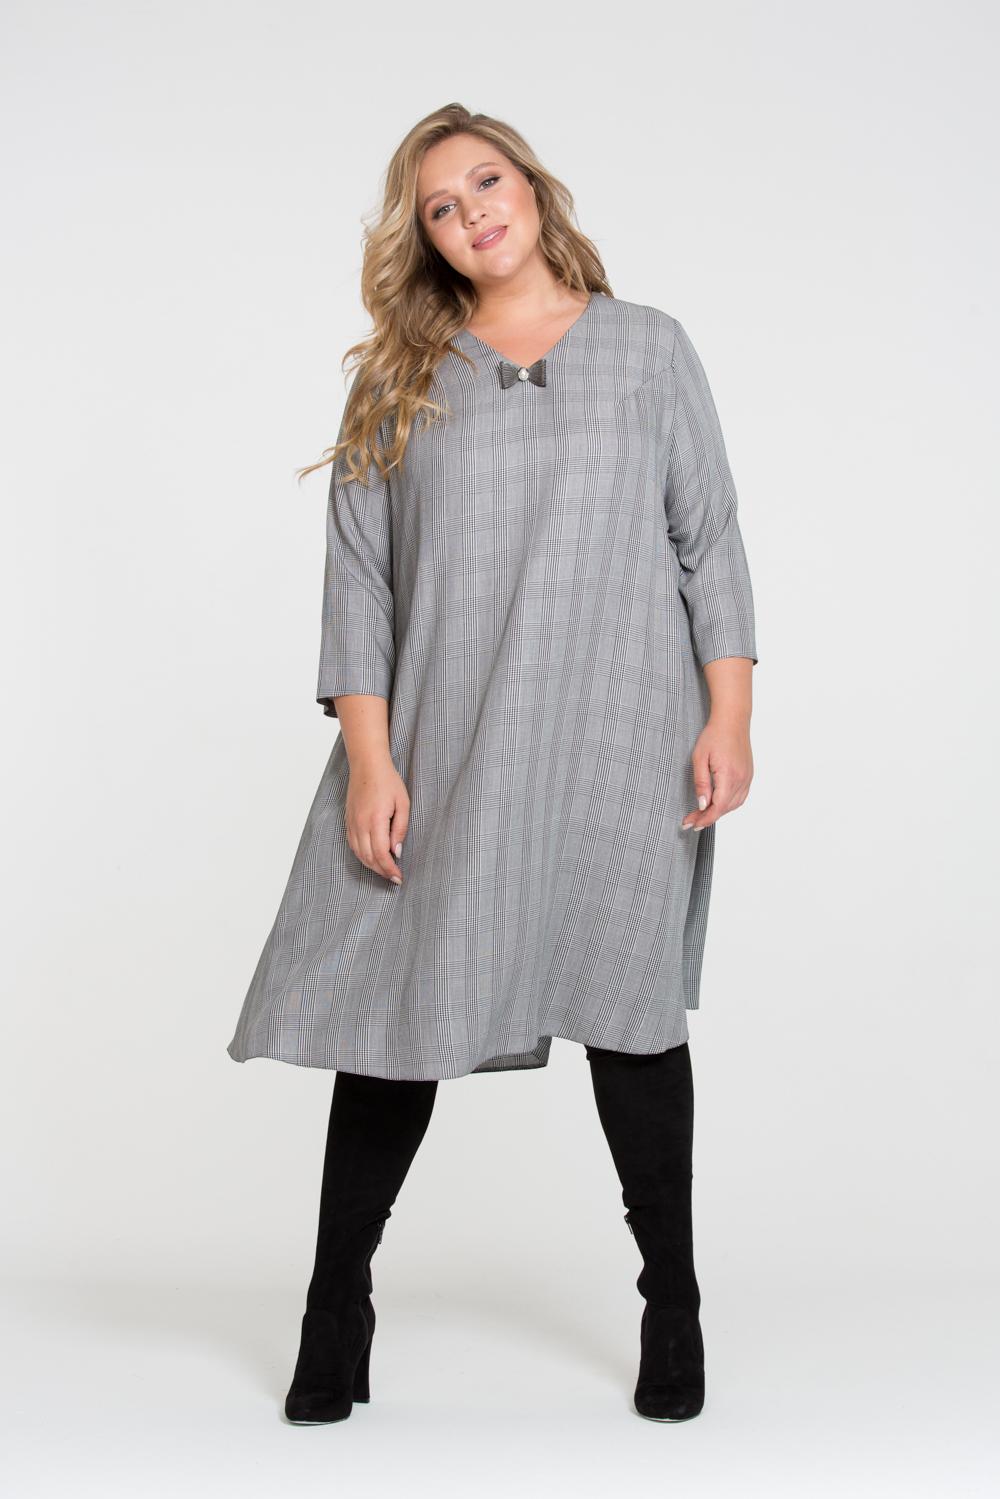 Платья Платье Палома серый 3fd9a0cae93cae5ce5c62073bb71c624.jpg